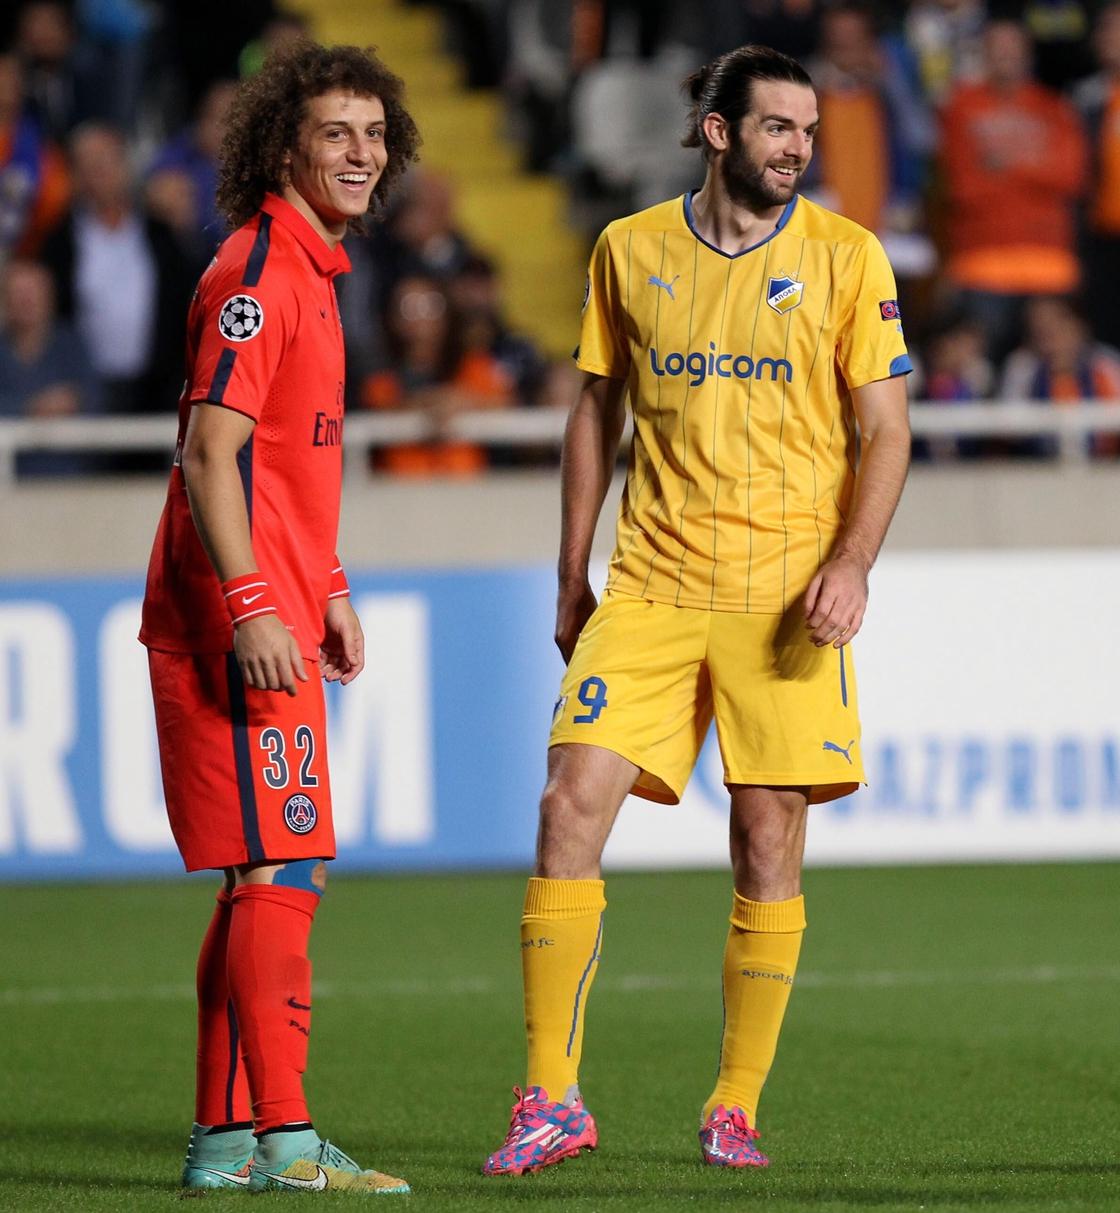 Image - David Luiz (L) marking Sheridan when APOEL faced PSG